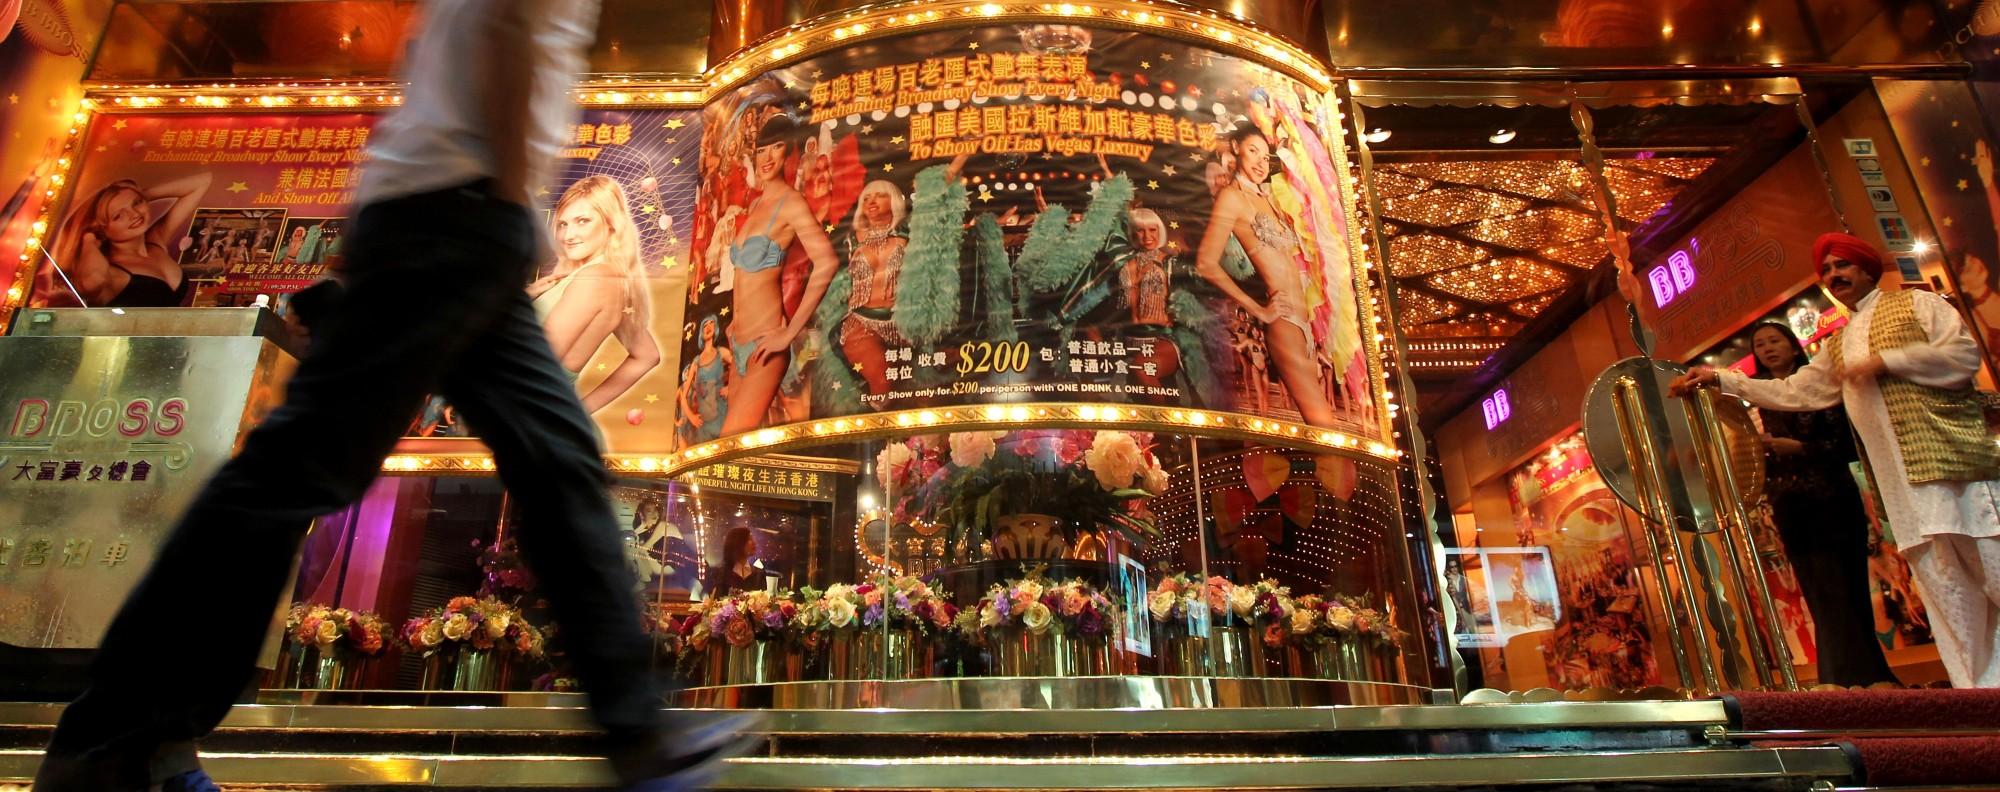 The Bboss nightclub in Tsim Sha Tsui. Photo: SCMP Pictures